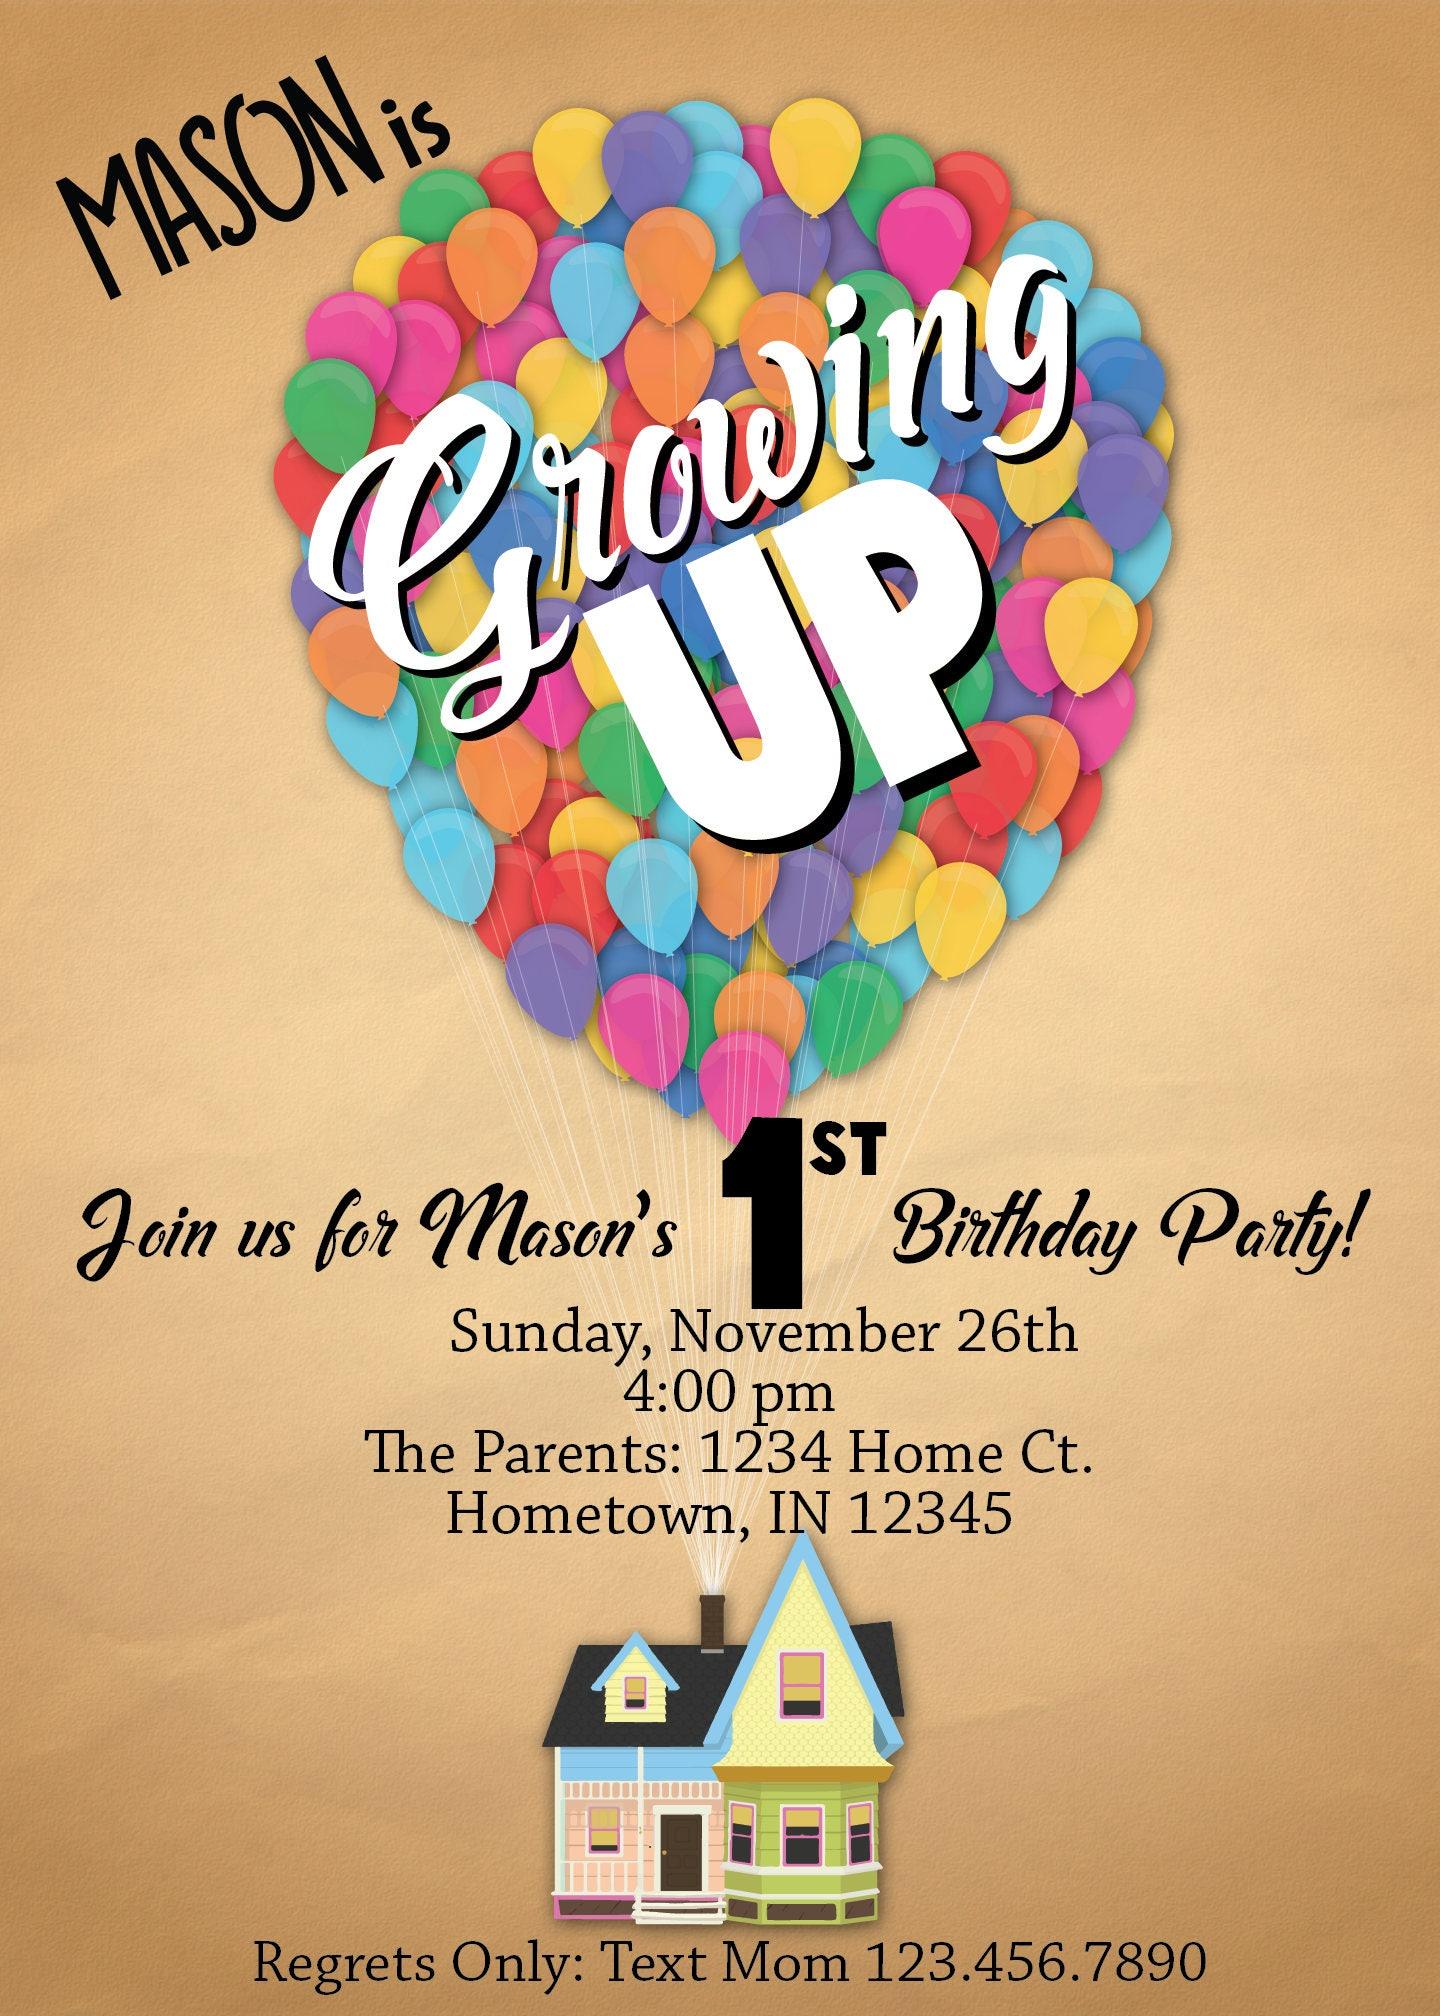 disney pixar up birthday party invitation